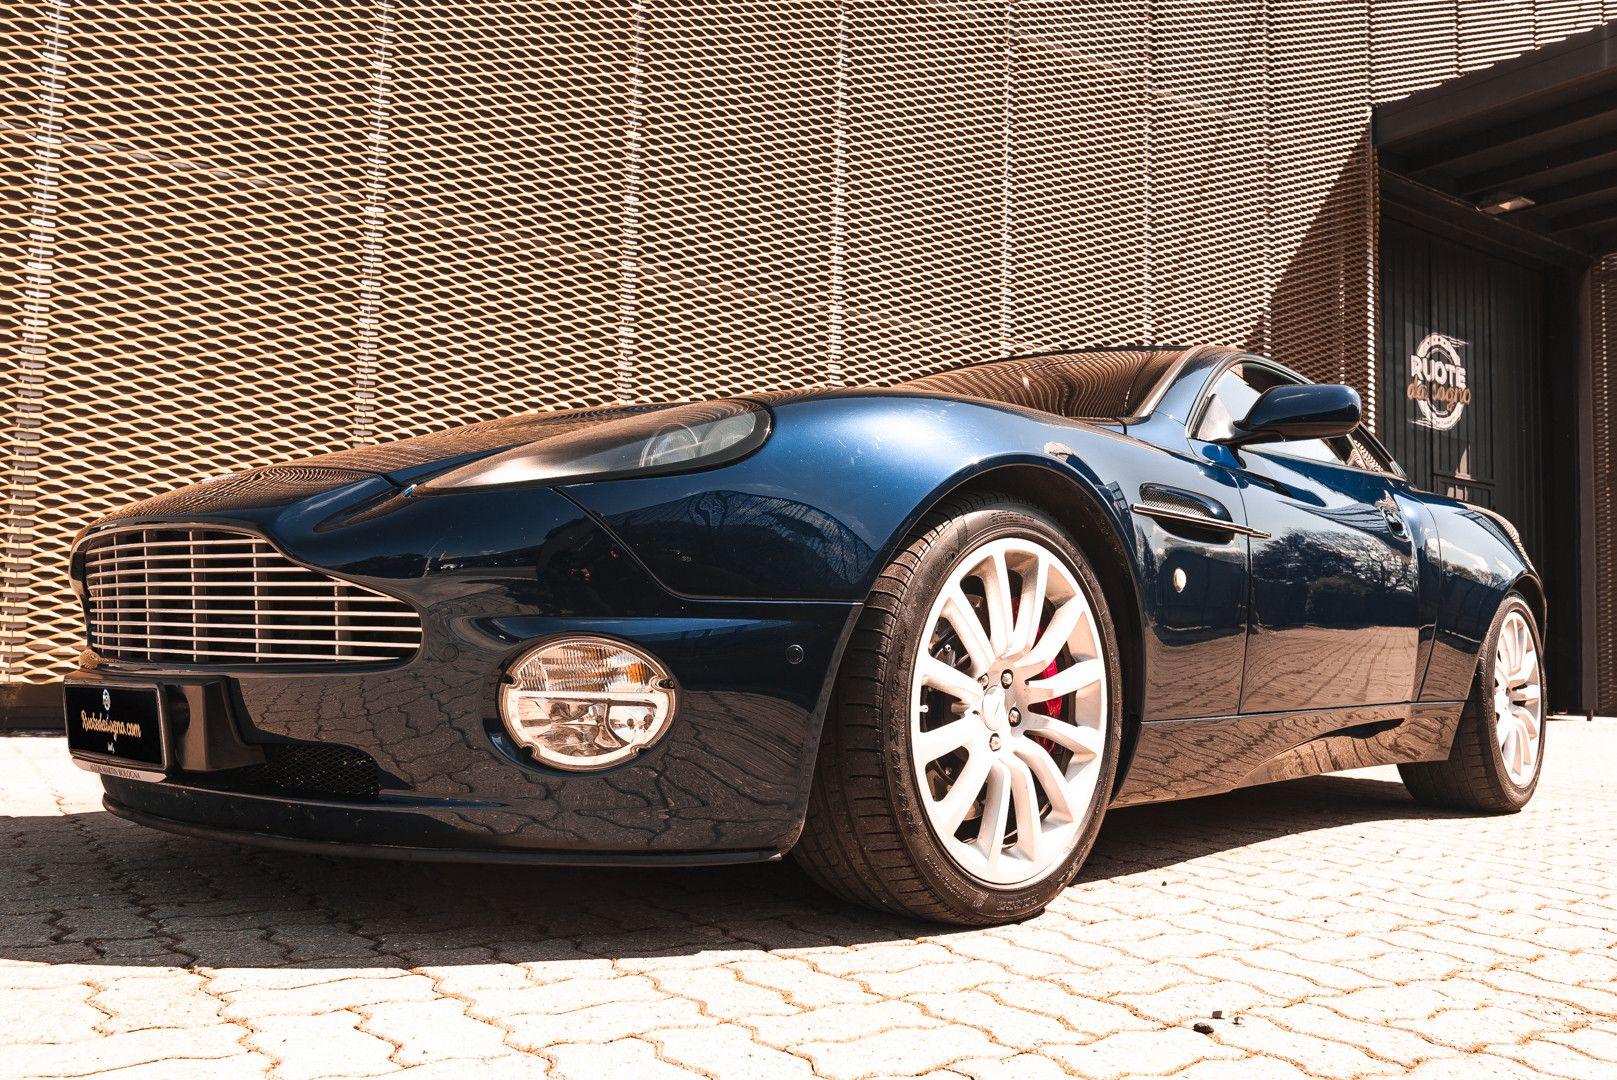 2001 Aston Martin V12 Vanquish 67923